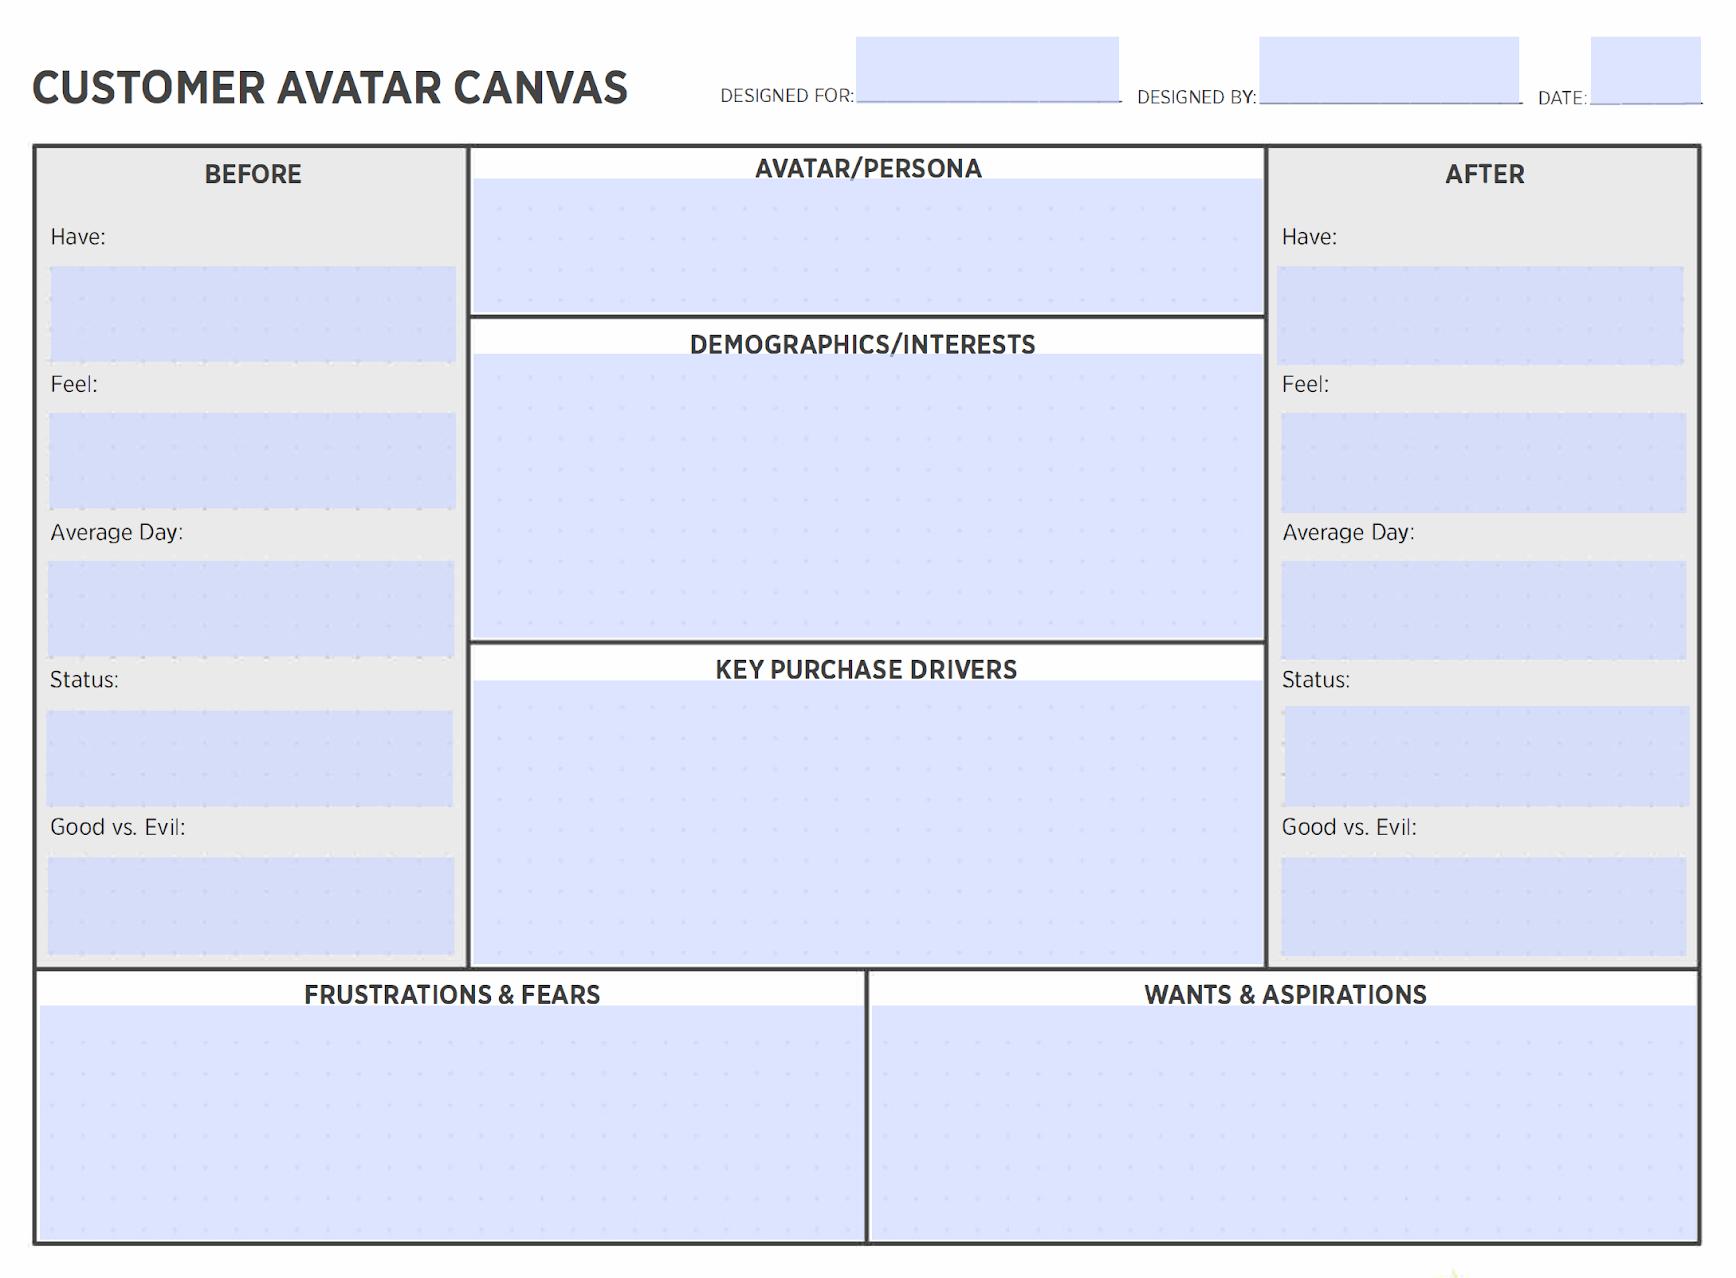 Customer Avatar Canvas